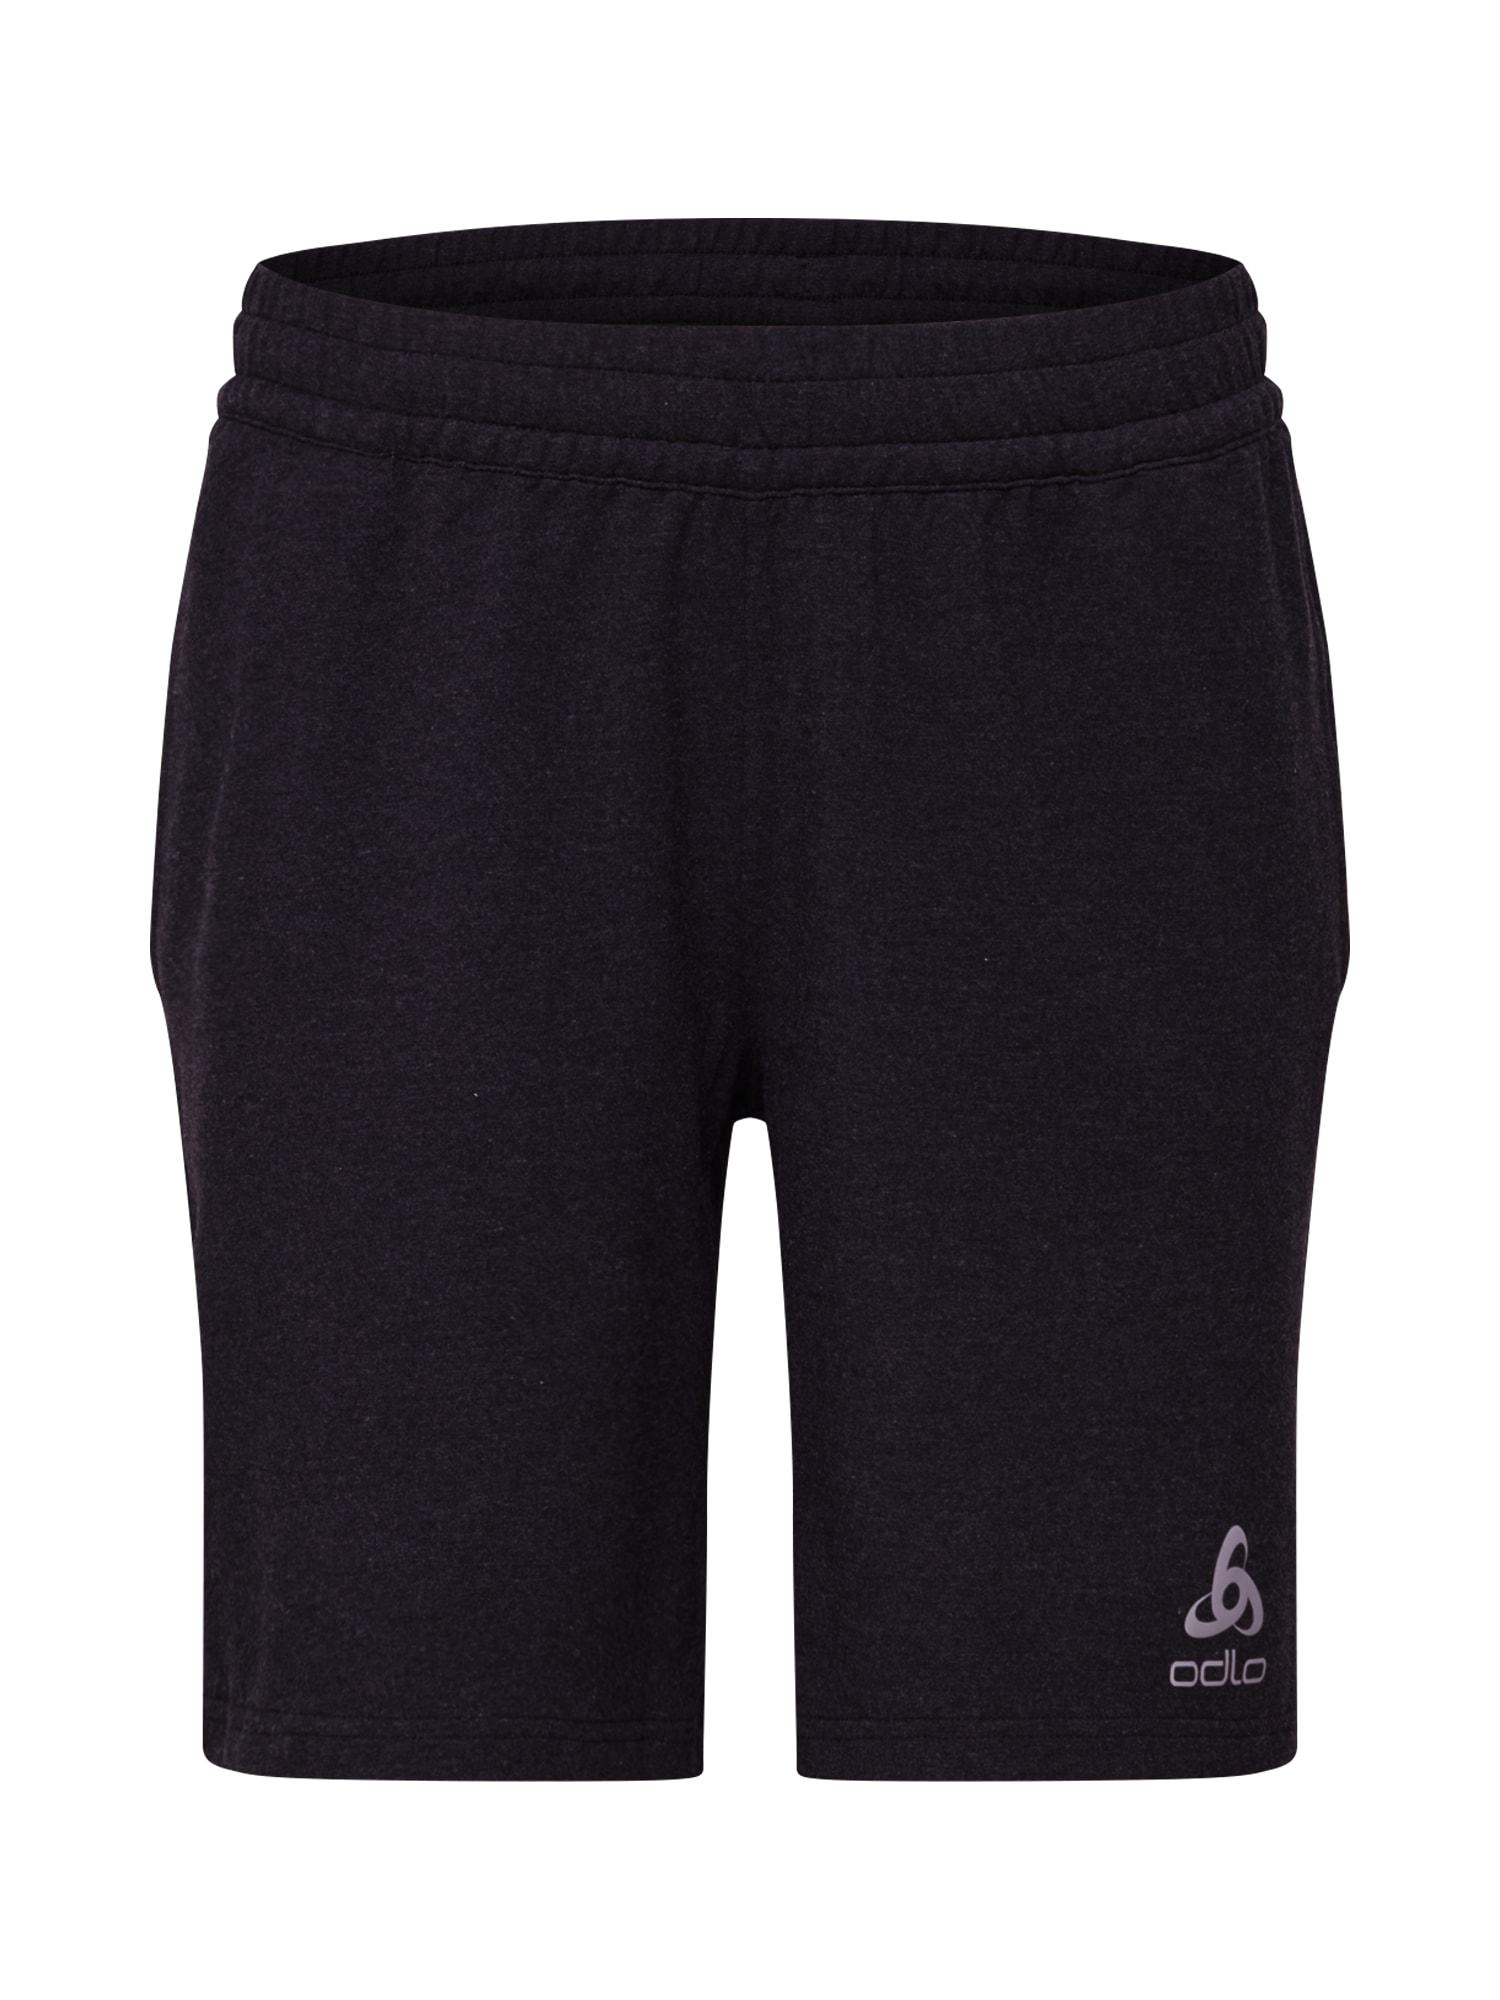 ODLO Sportinės kelnės 'Shorts MILLENNIUM ELEMENT ' juoda